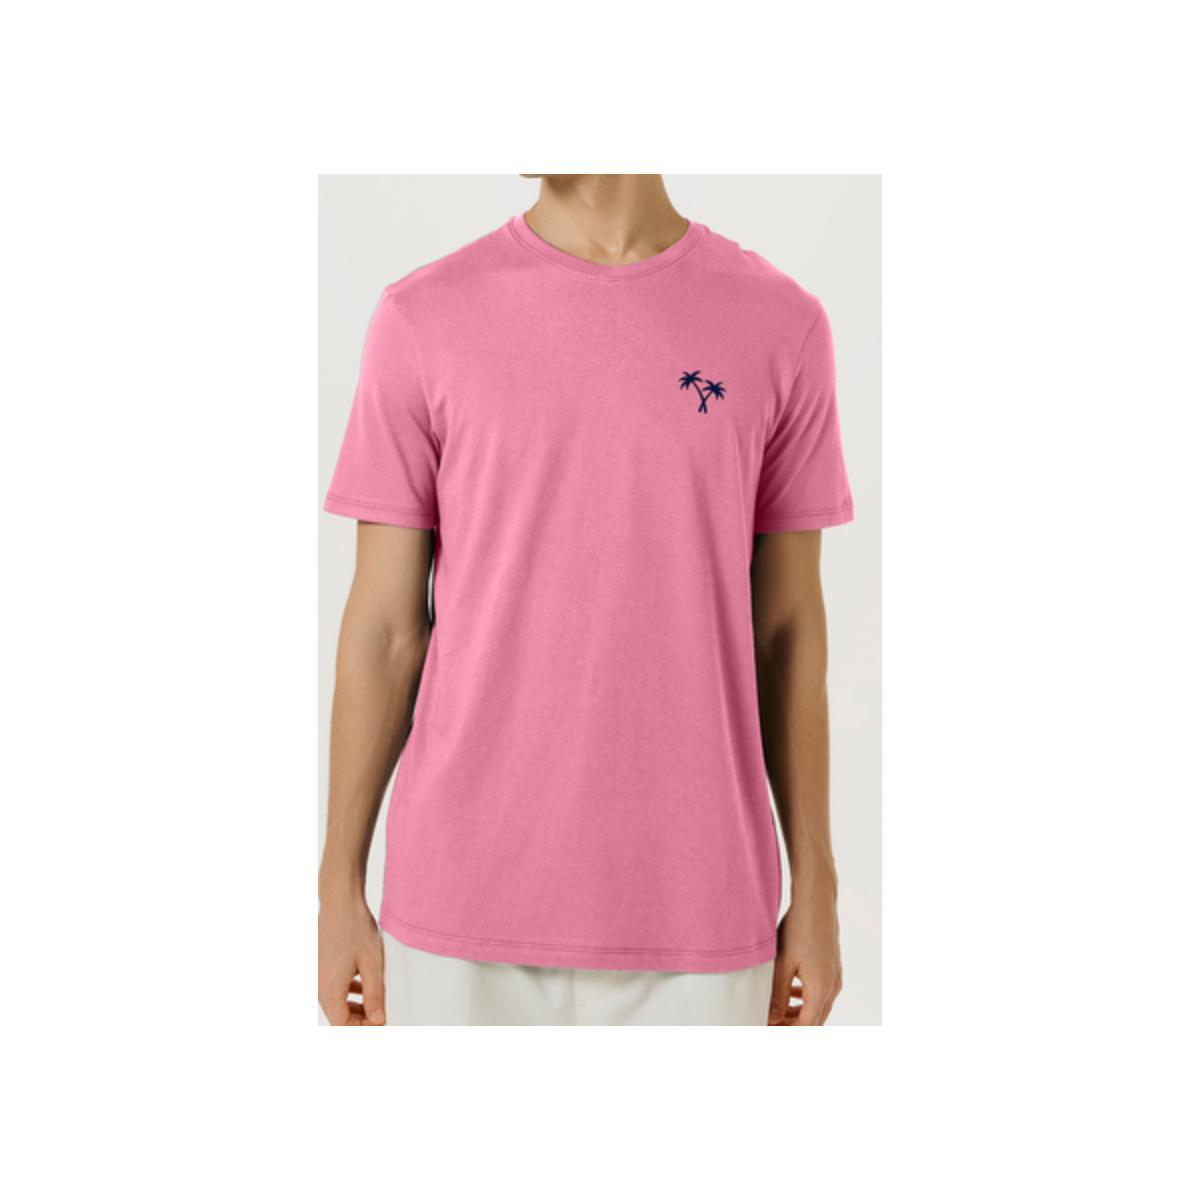 Camiseta Masculina Hering 4fdp Kapen Rosa